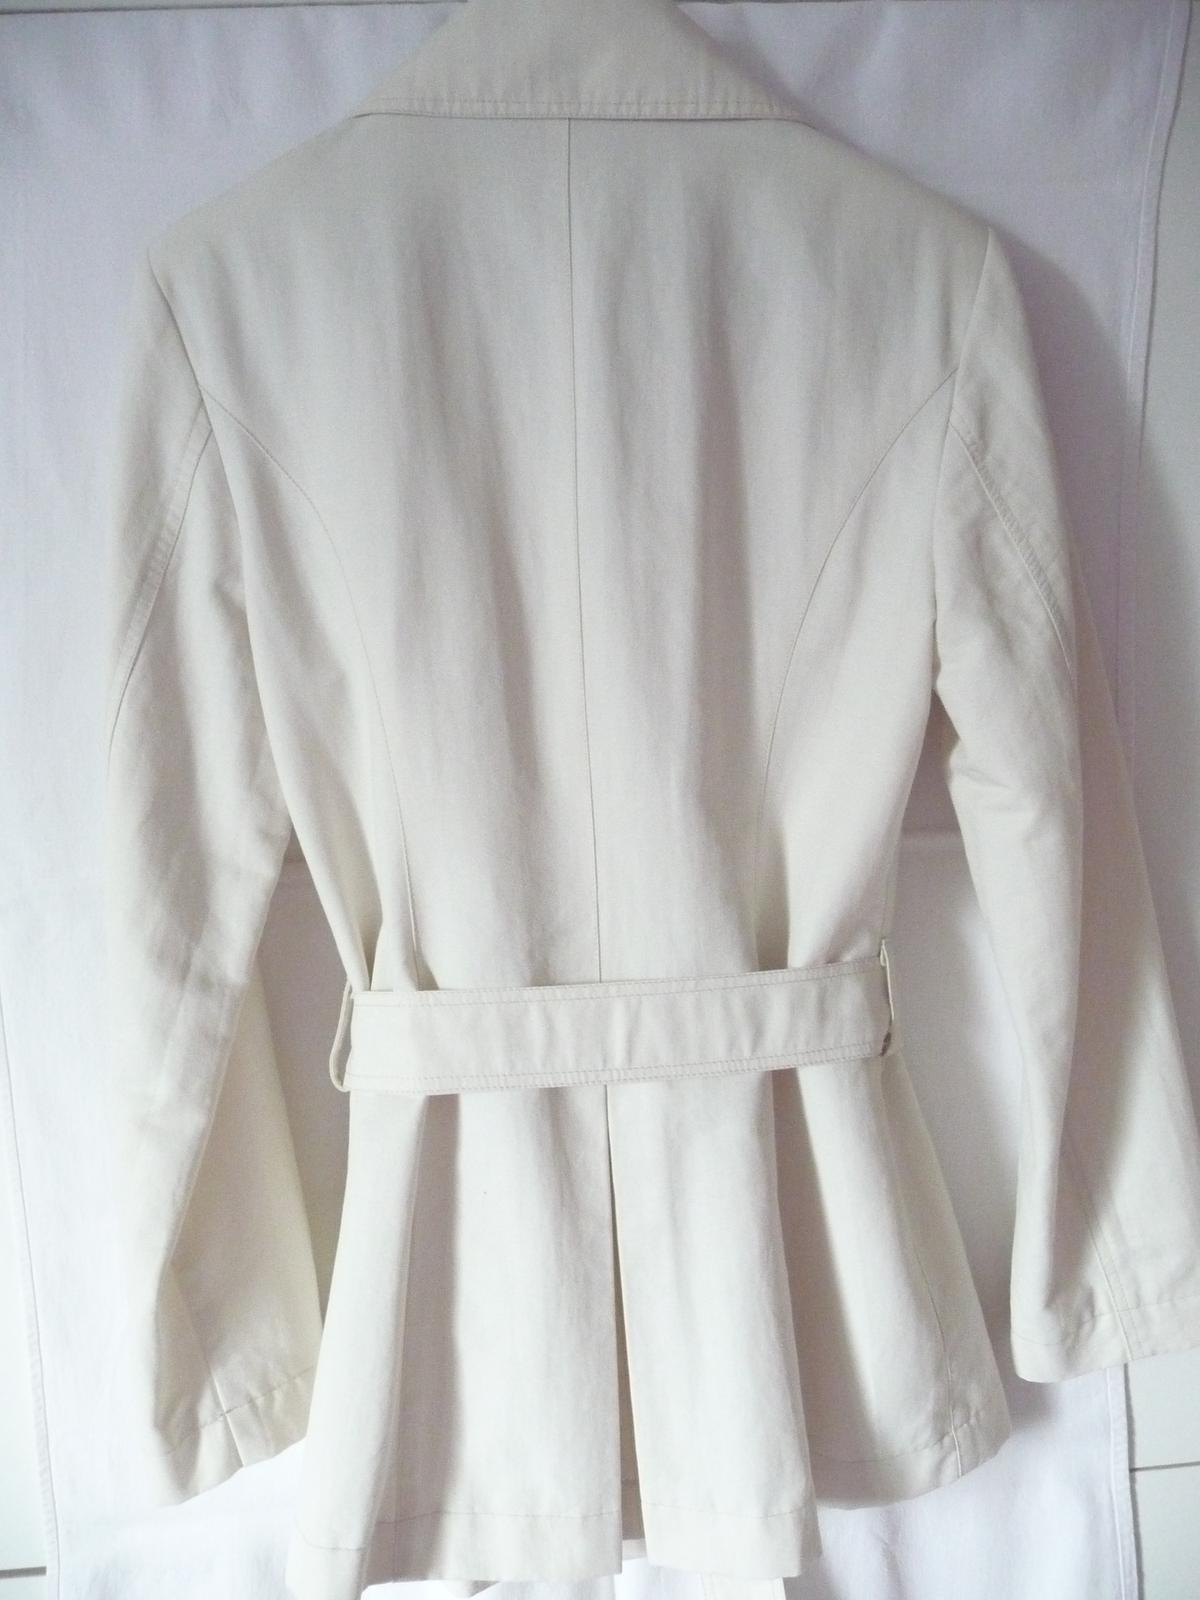 Maslový kabátik  - Obrázok č. 2